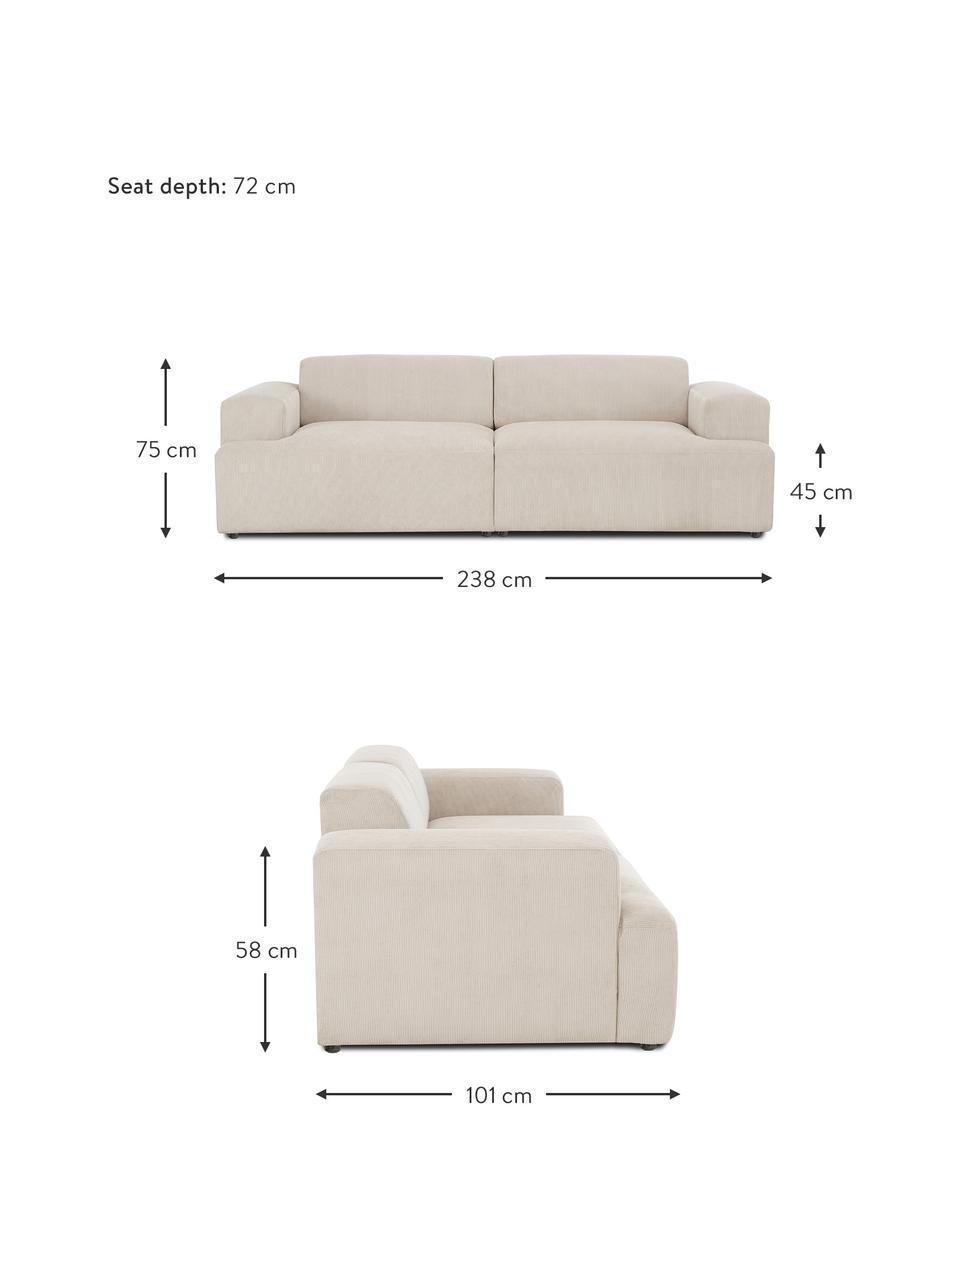 Cord-Sofa Melva (3-Sitzer) in Beige, Bezug: Cord (92% Polyester, 8% P, Gestell: Massives Kiefernholz, FSC, Füße: Kunststoff, Cord Beige, B 238 x T 101 cm